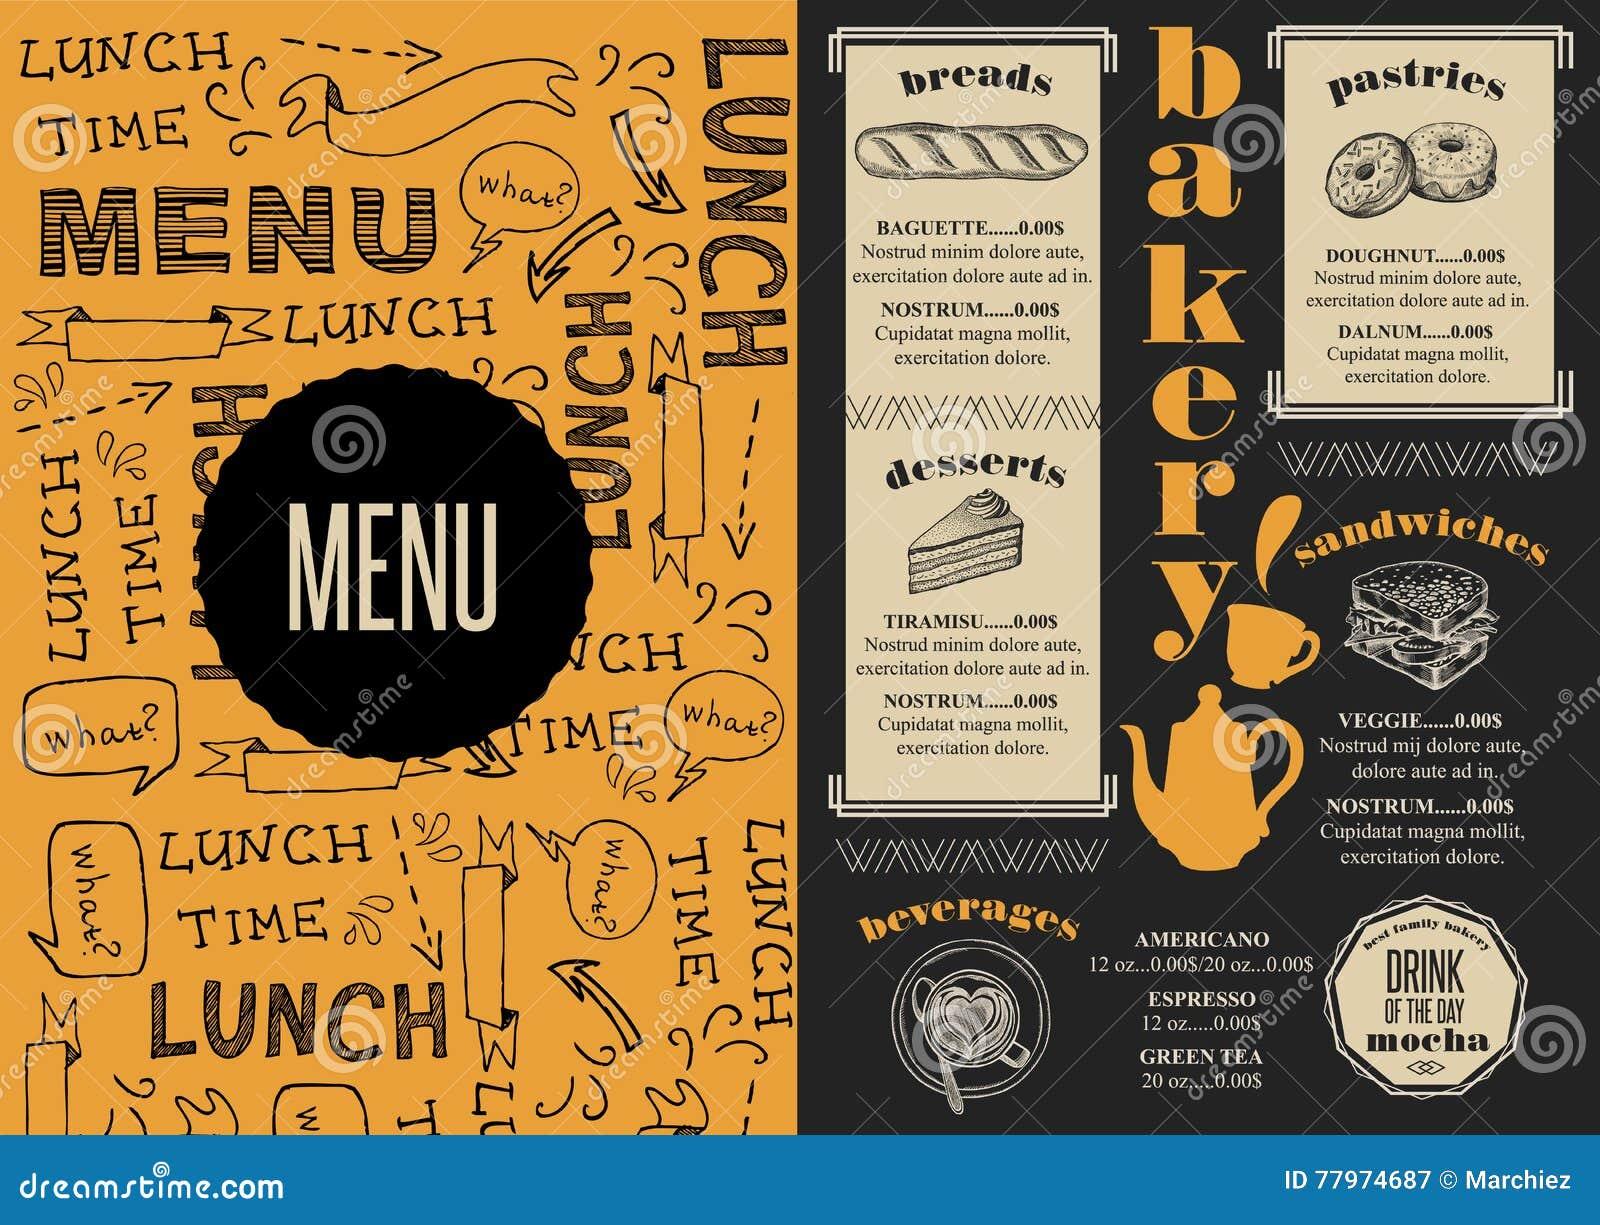 Menu bakery restaurant food template placemat stock vector menu bakery restaurant food template placemat altavistaventures Image collections